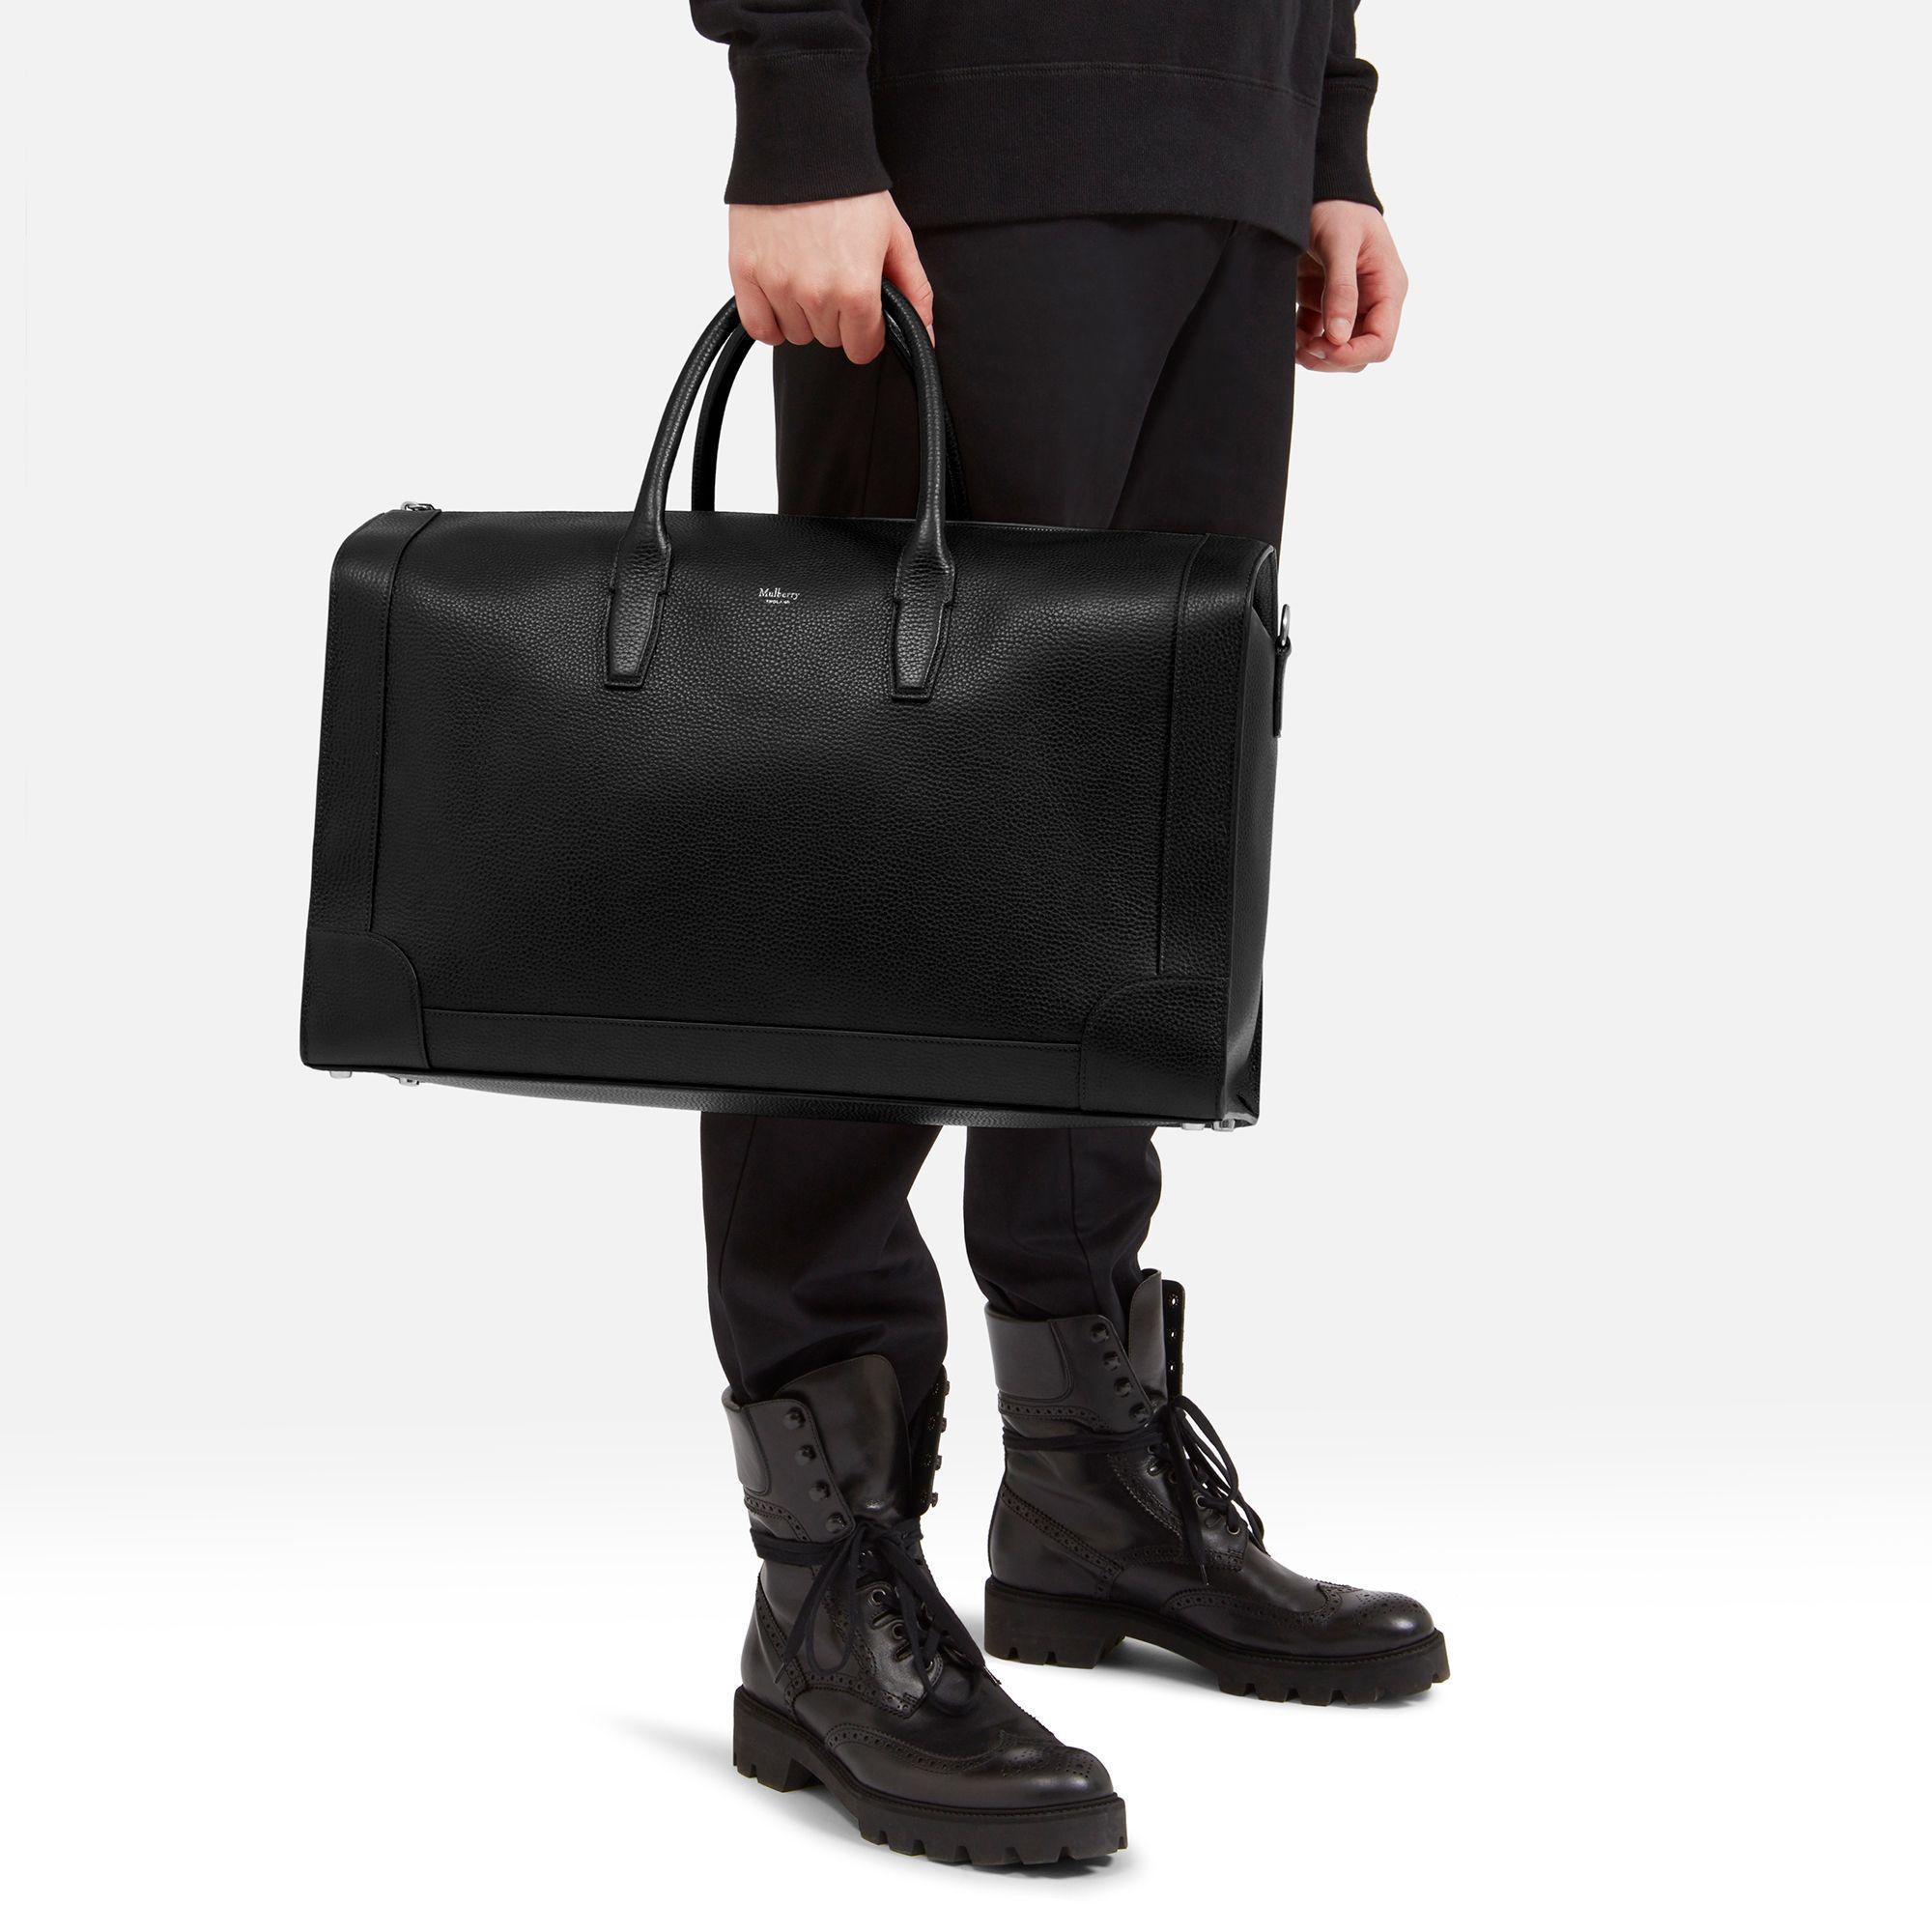 2928d47fb9d6 ... sweden lyst mulberry belgrave travel bag in black for men 2e91d 3ebdf